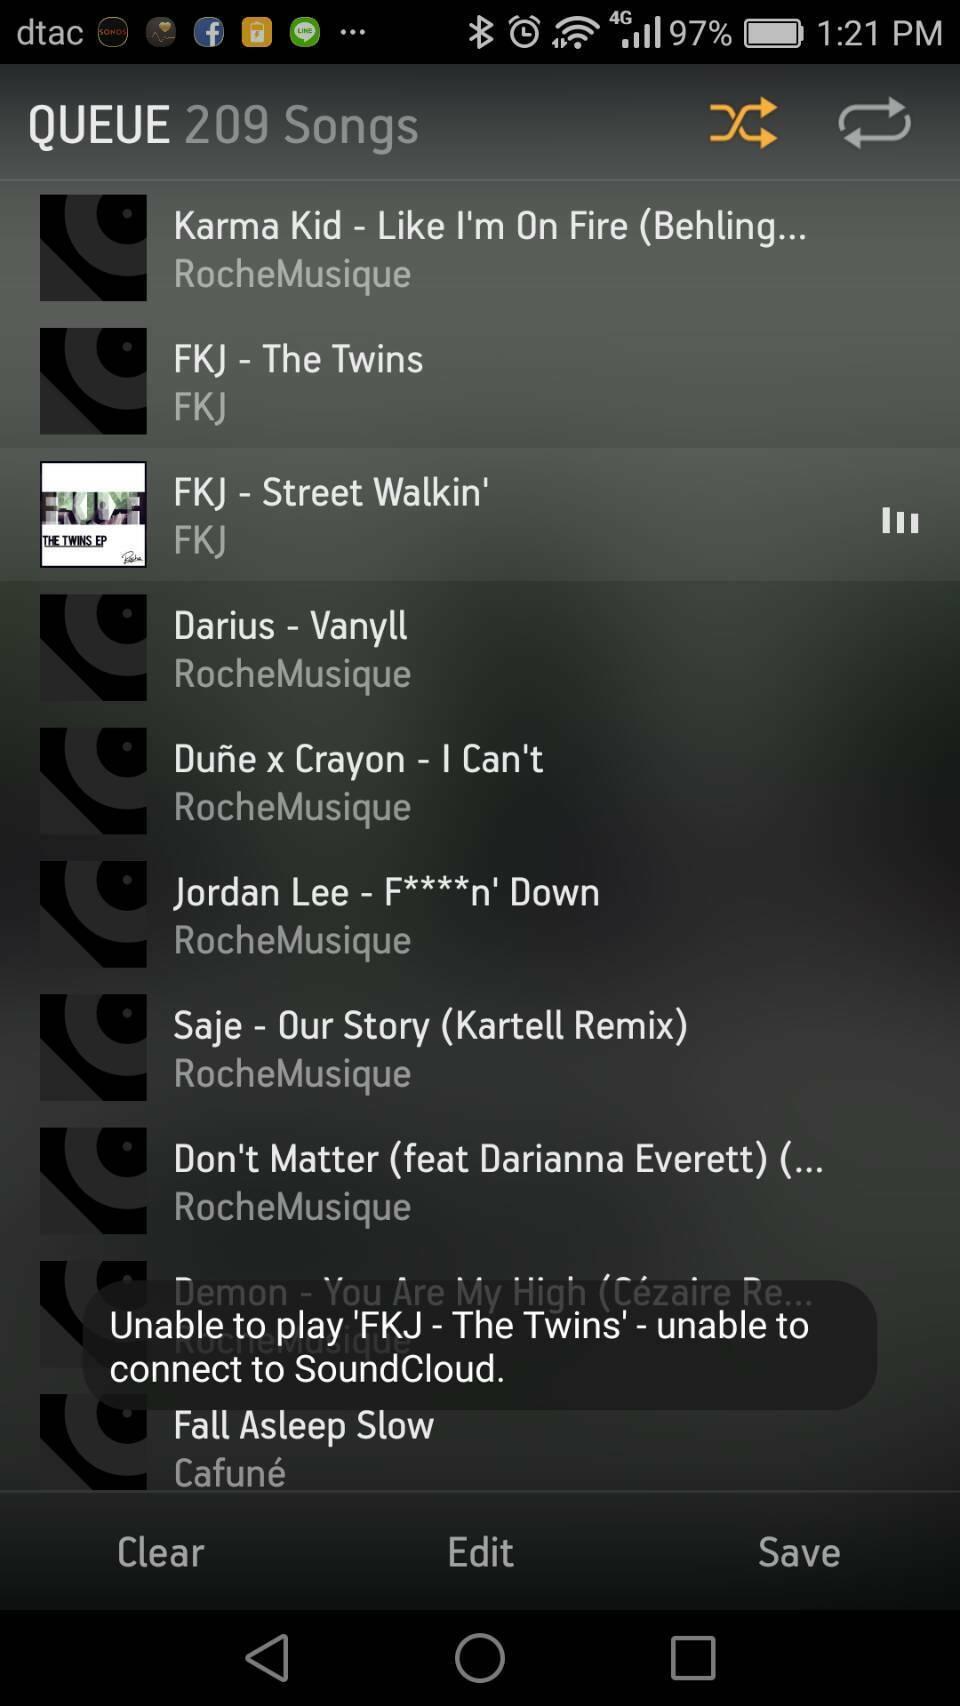 Unable to connect to SoundCloud | Sonos Community